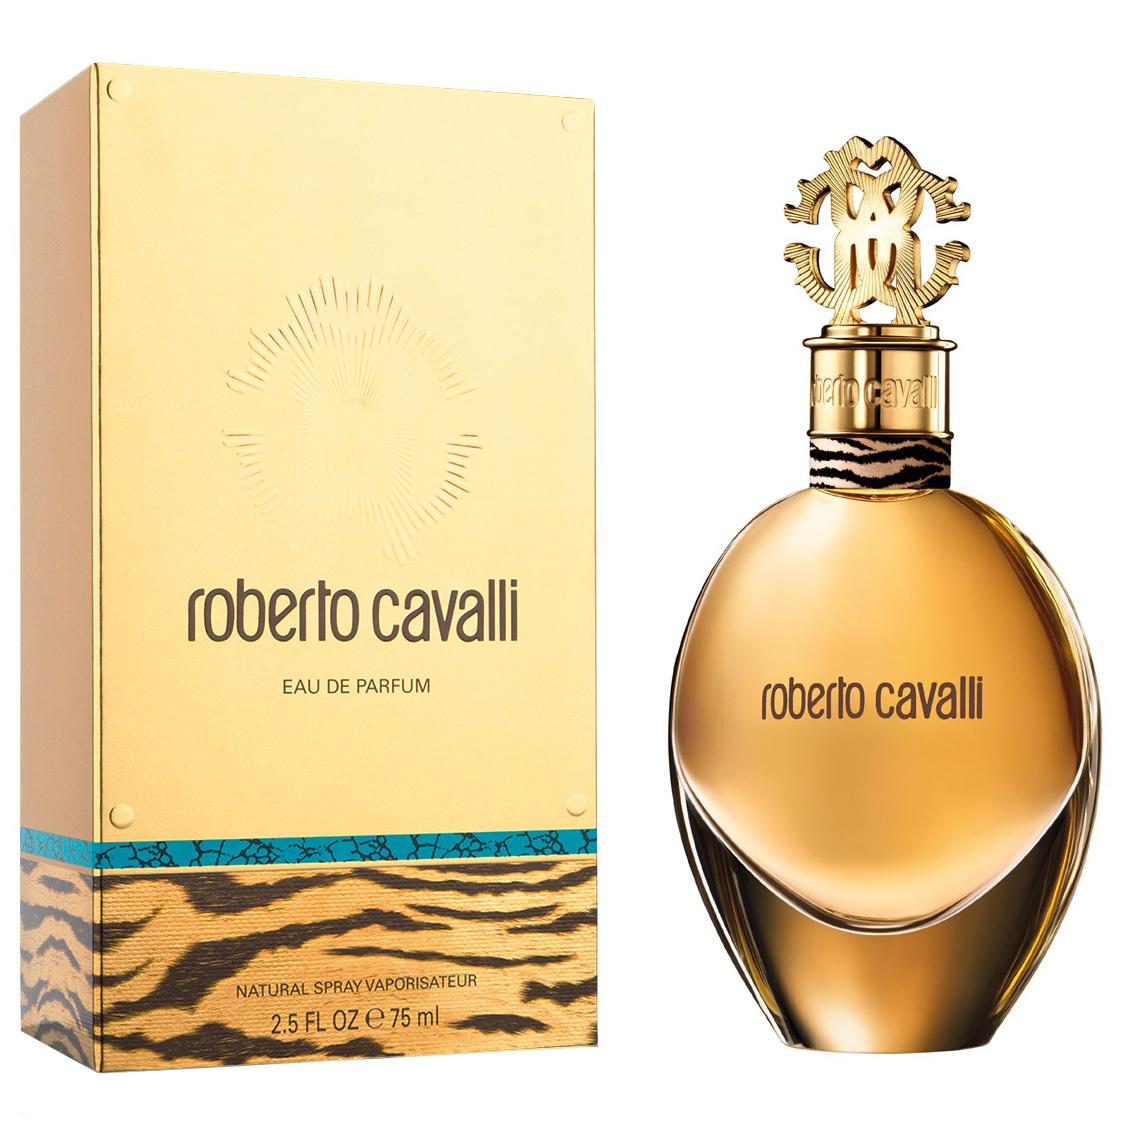 Roberto Cavalli Eau de Parfum - parfémová voda W Objem: 30 ml